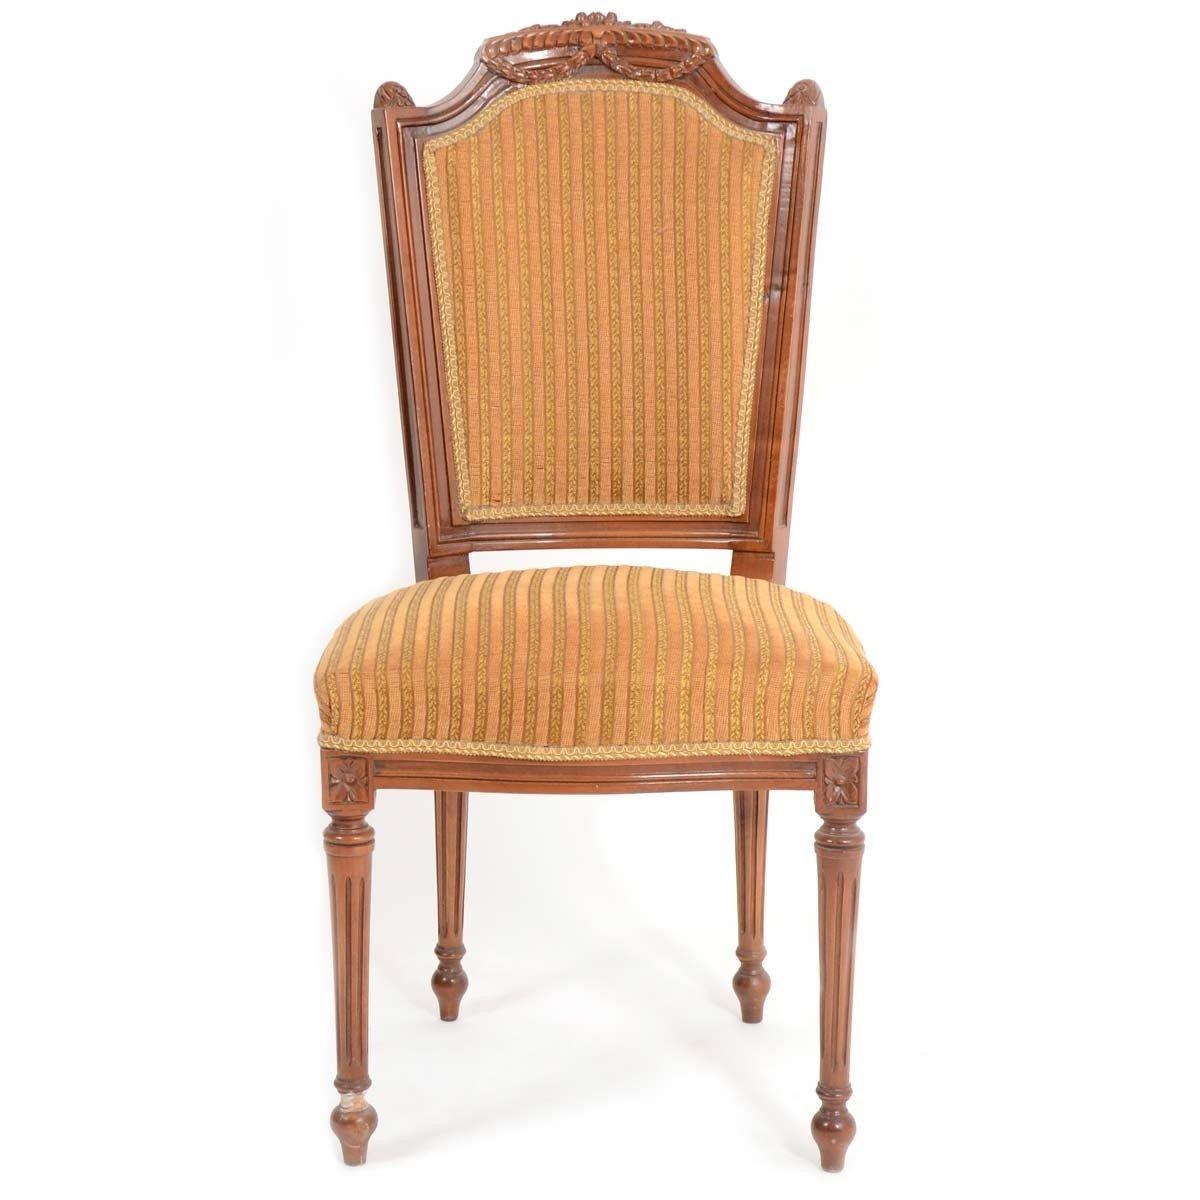 Stuhl - Stil Antik | Barock | Rokkoko | Louis XV / XVI | Klassische | Handgefertigt | Massivholz